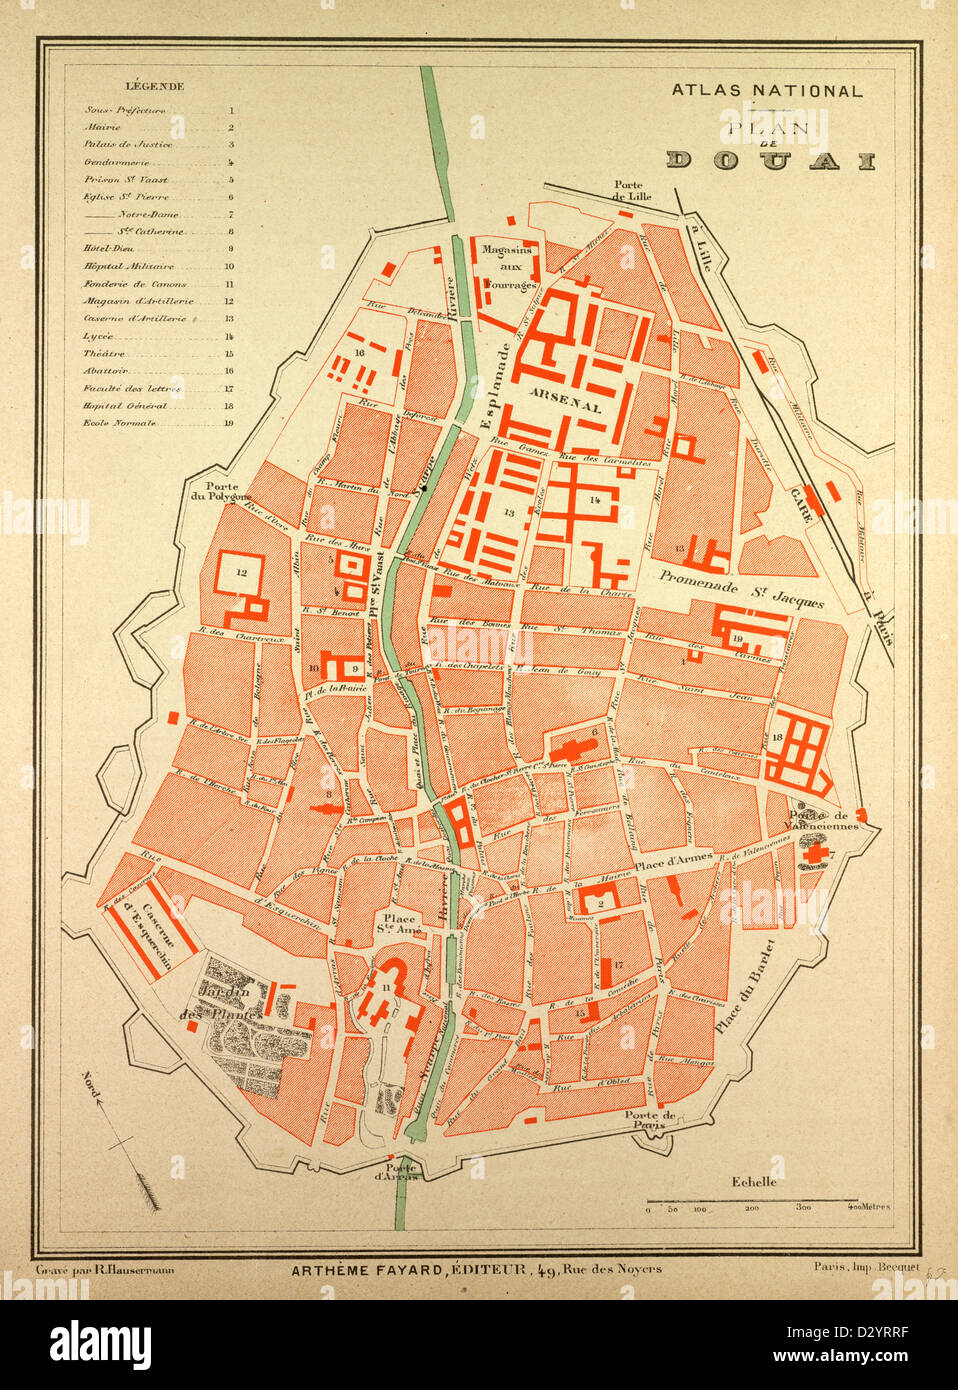 MAP OF DOUAI FRANCE Stock Photo Alamy - Rue france map